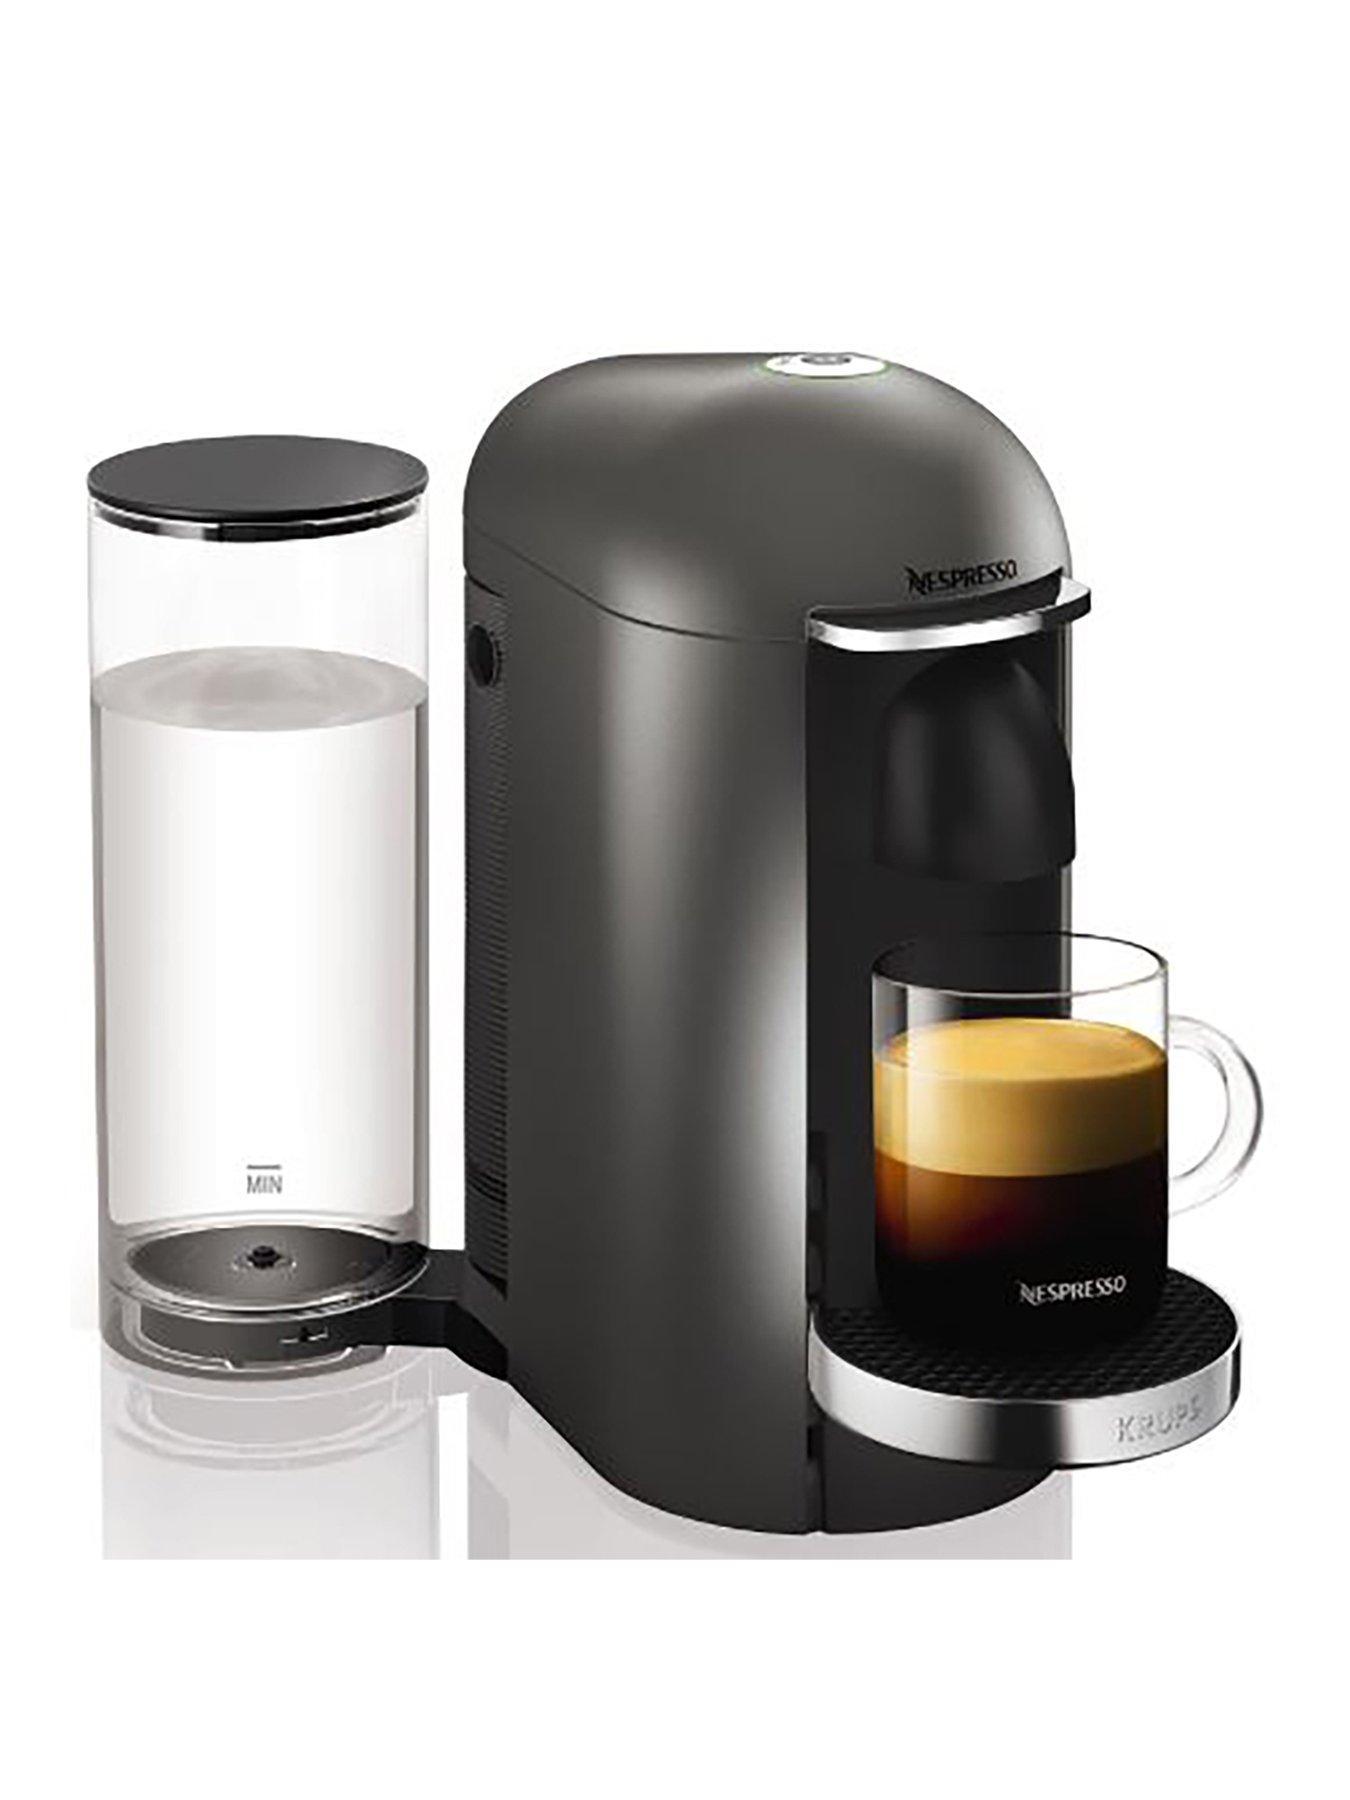 Captivating Nespresso XN900T40 Vertuo Plus Coffee Machine By Krups   Titanium Idea